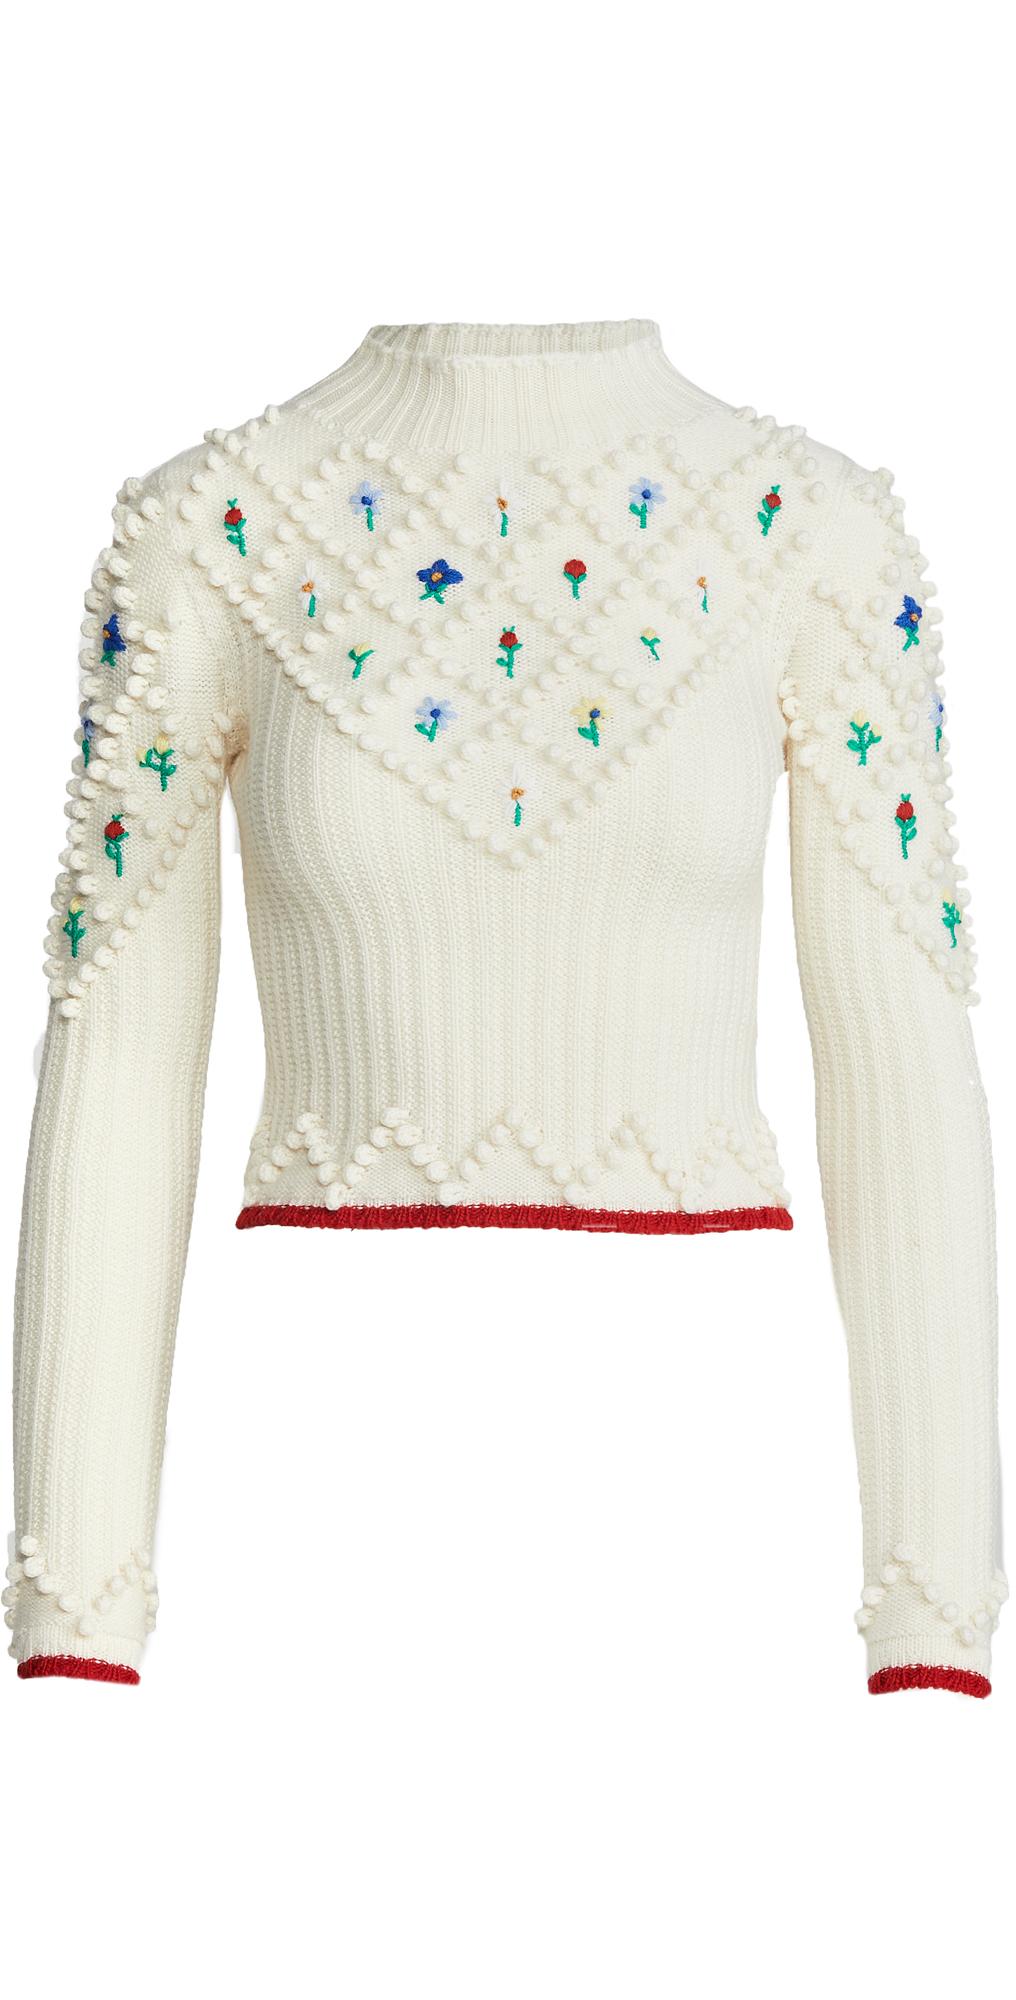 Philosophy di Lorenzo Serafini Floral Sweater | SHOPBOP